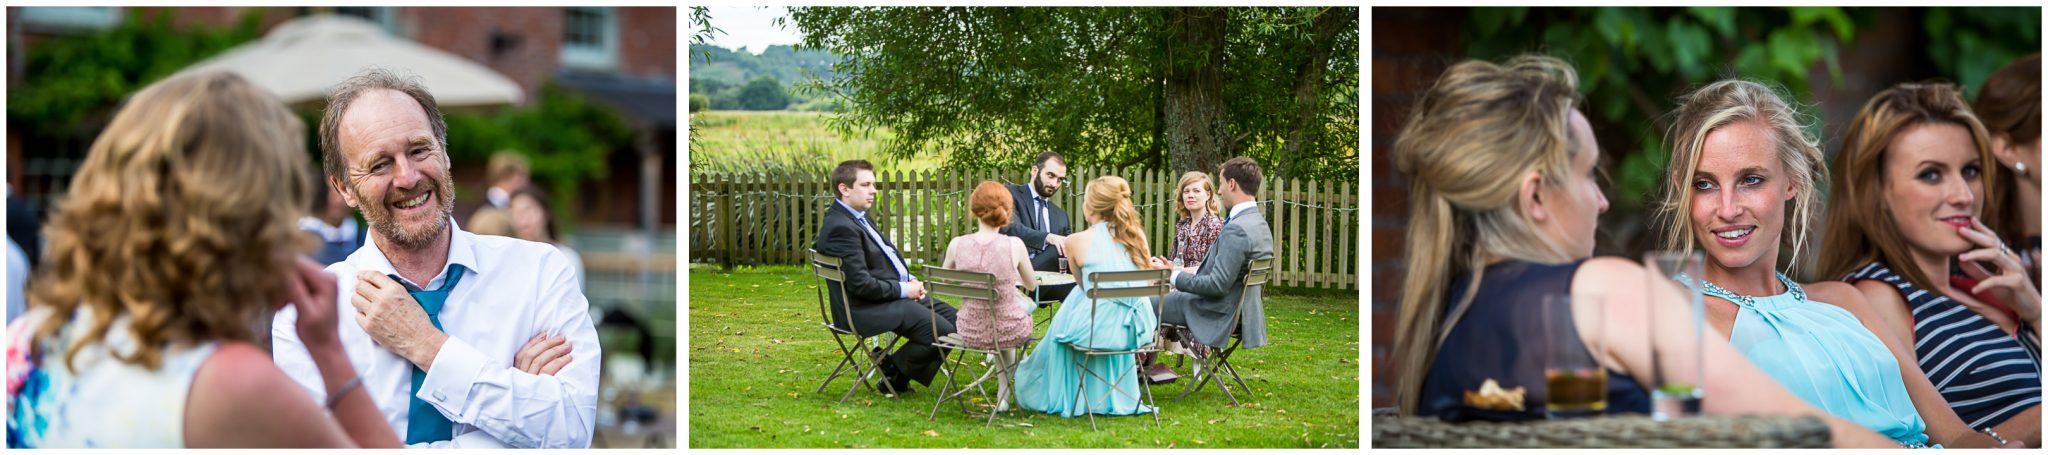 Sopley Mill Summer wedding after the wedding breakfast